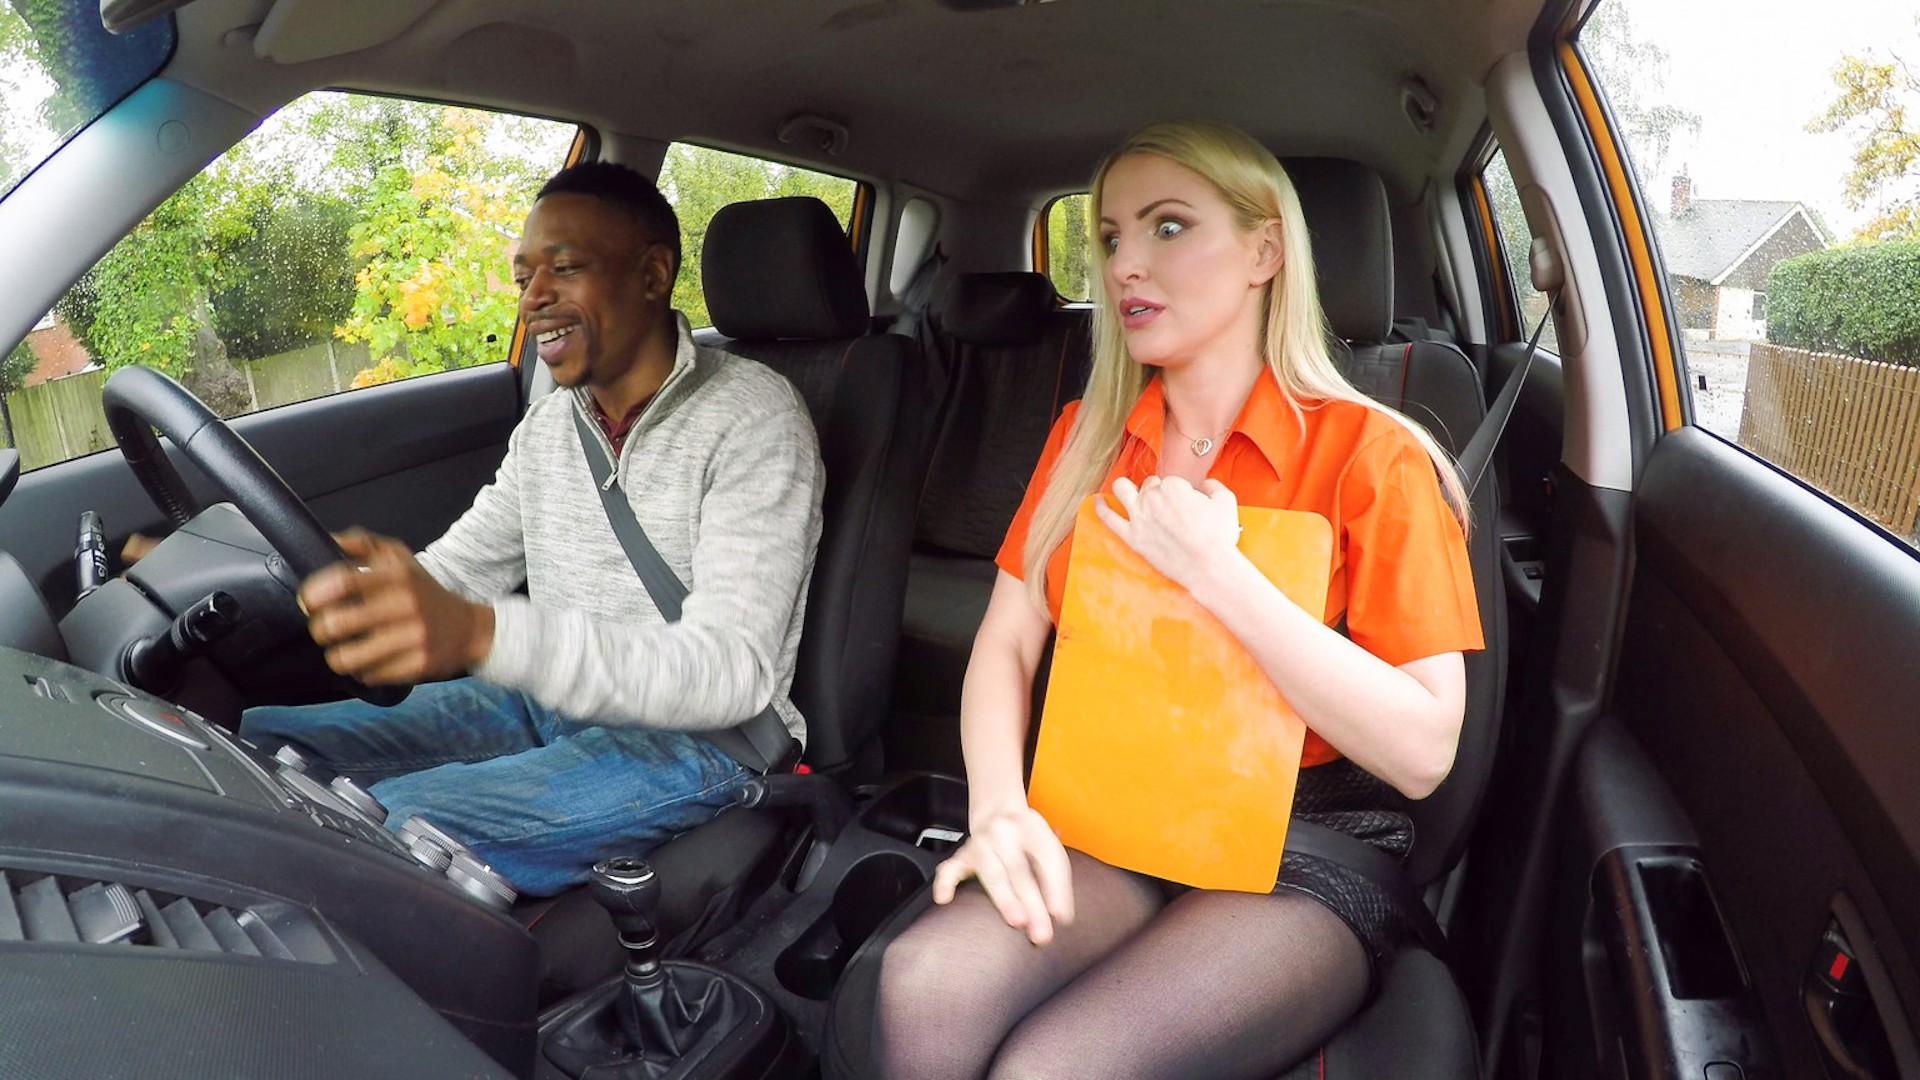 Long black cock pleases examiner - Fake Driving School